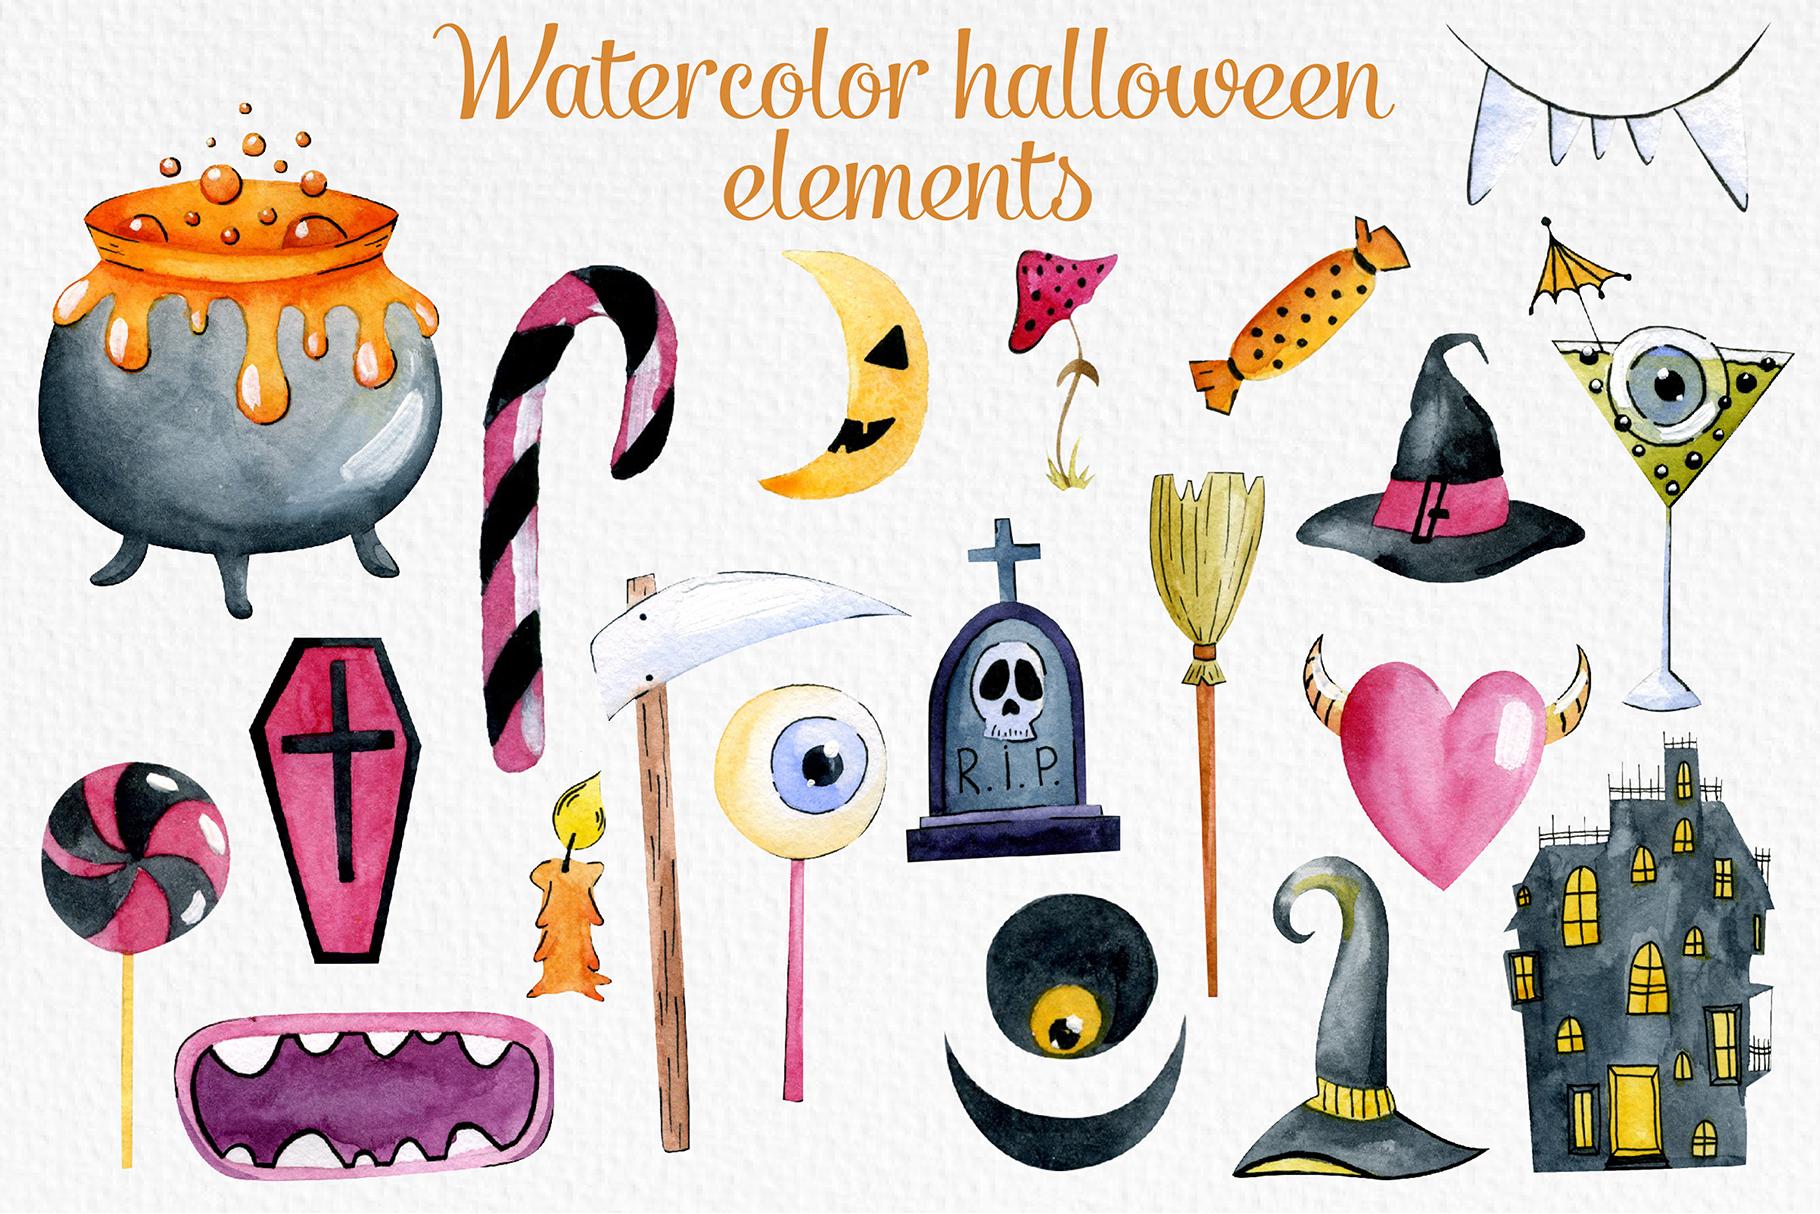 Watercolor halloween elements example image 1